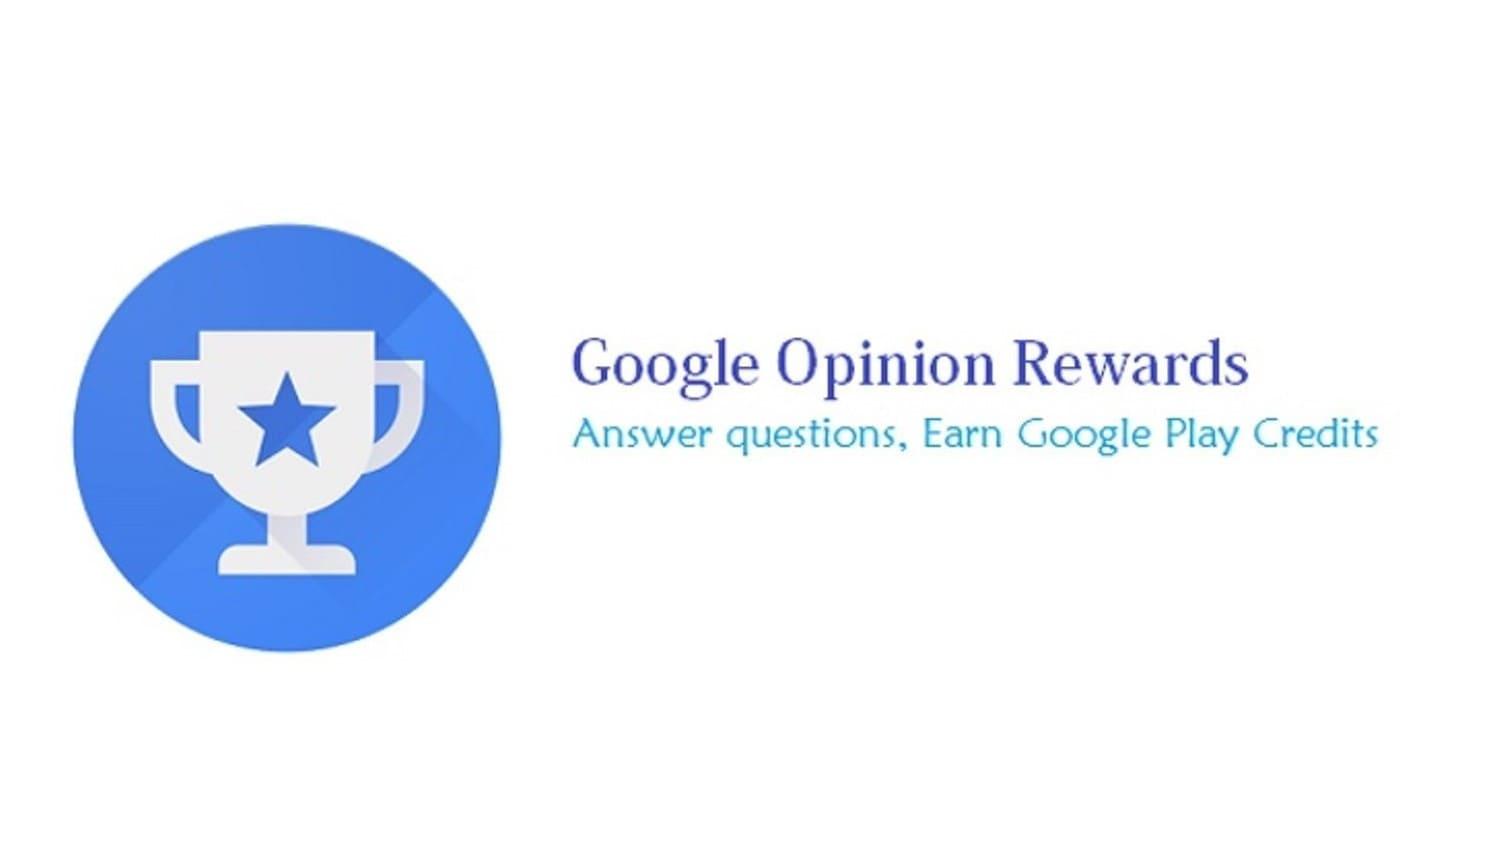 Google-Opinion-Rewards-app